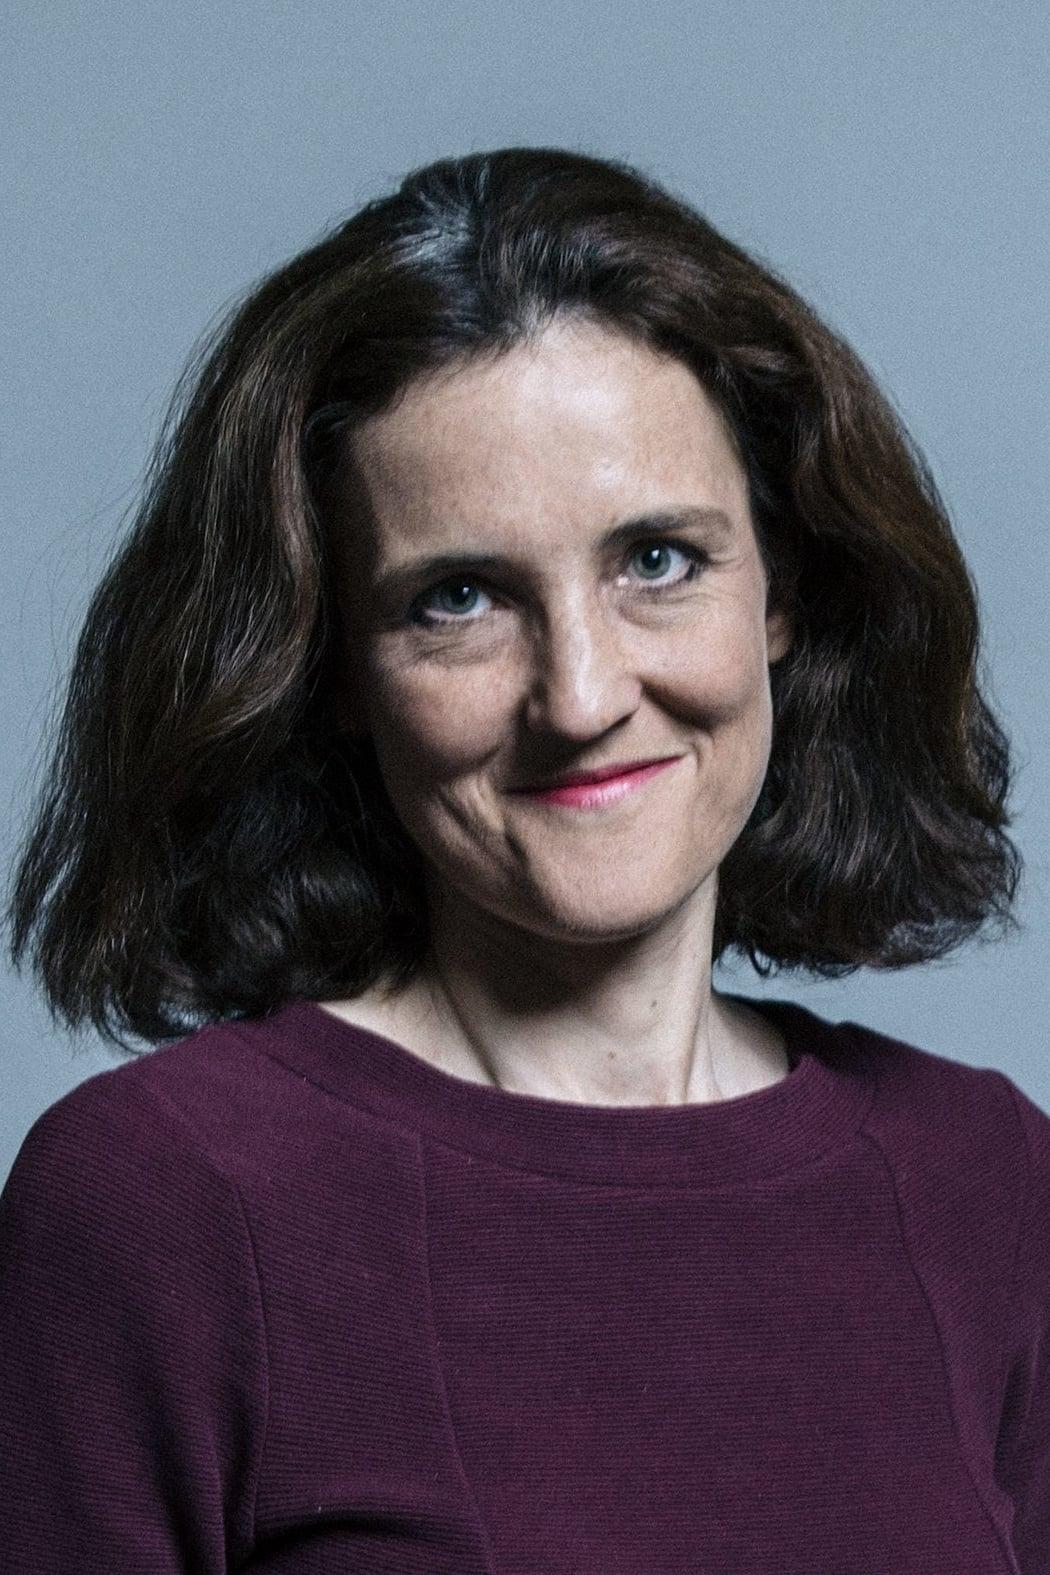 Theresa Villiers